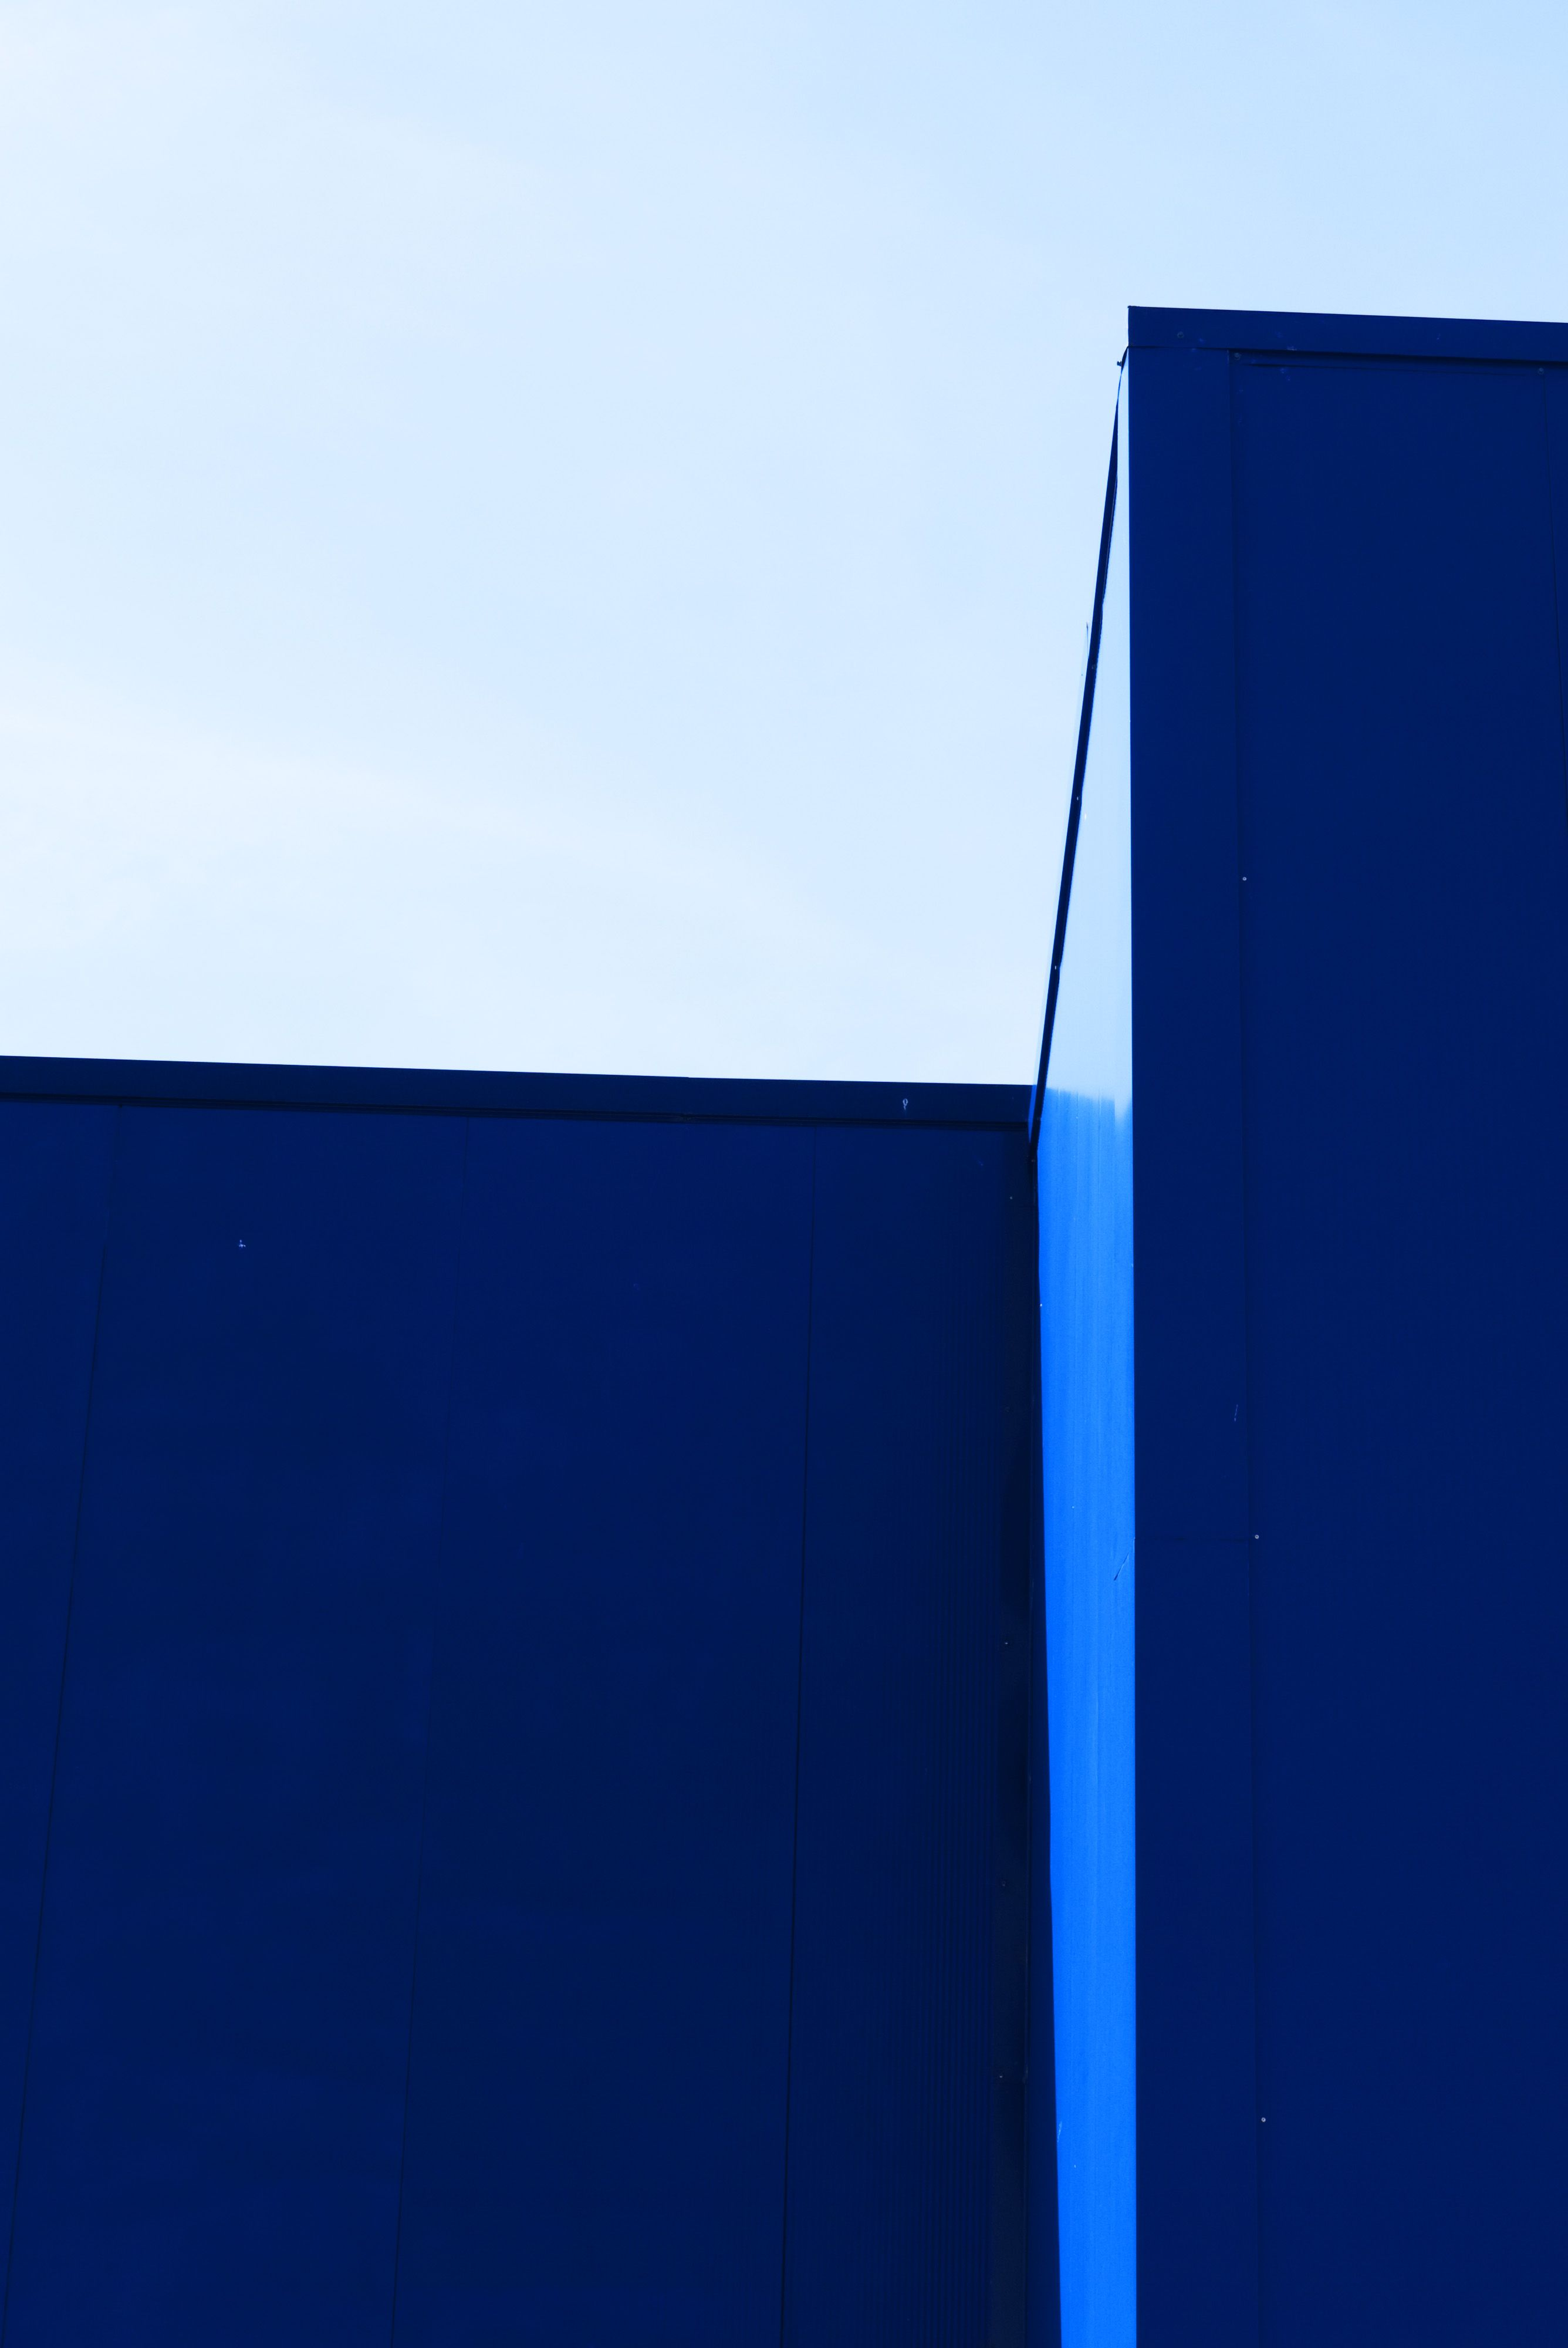 Block on block, #photo by Eduardo Seco